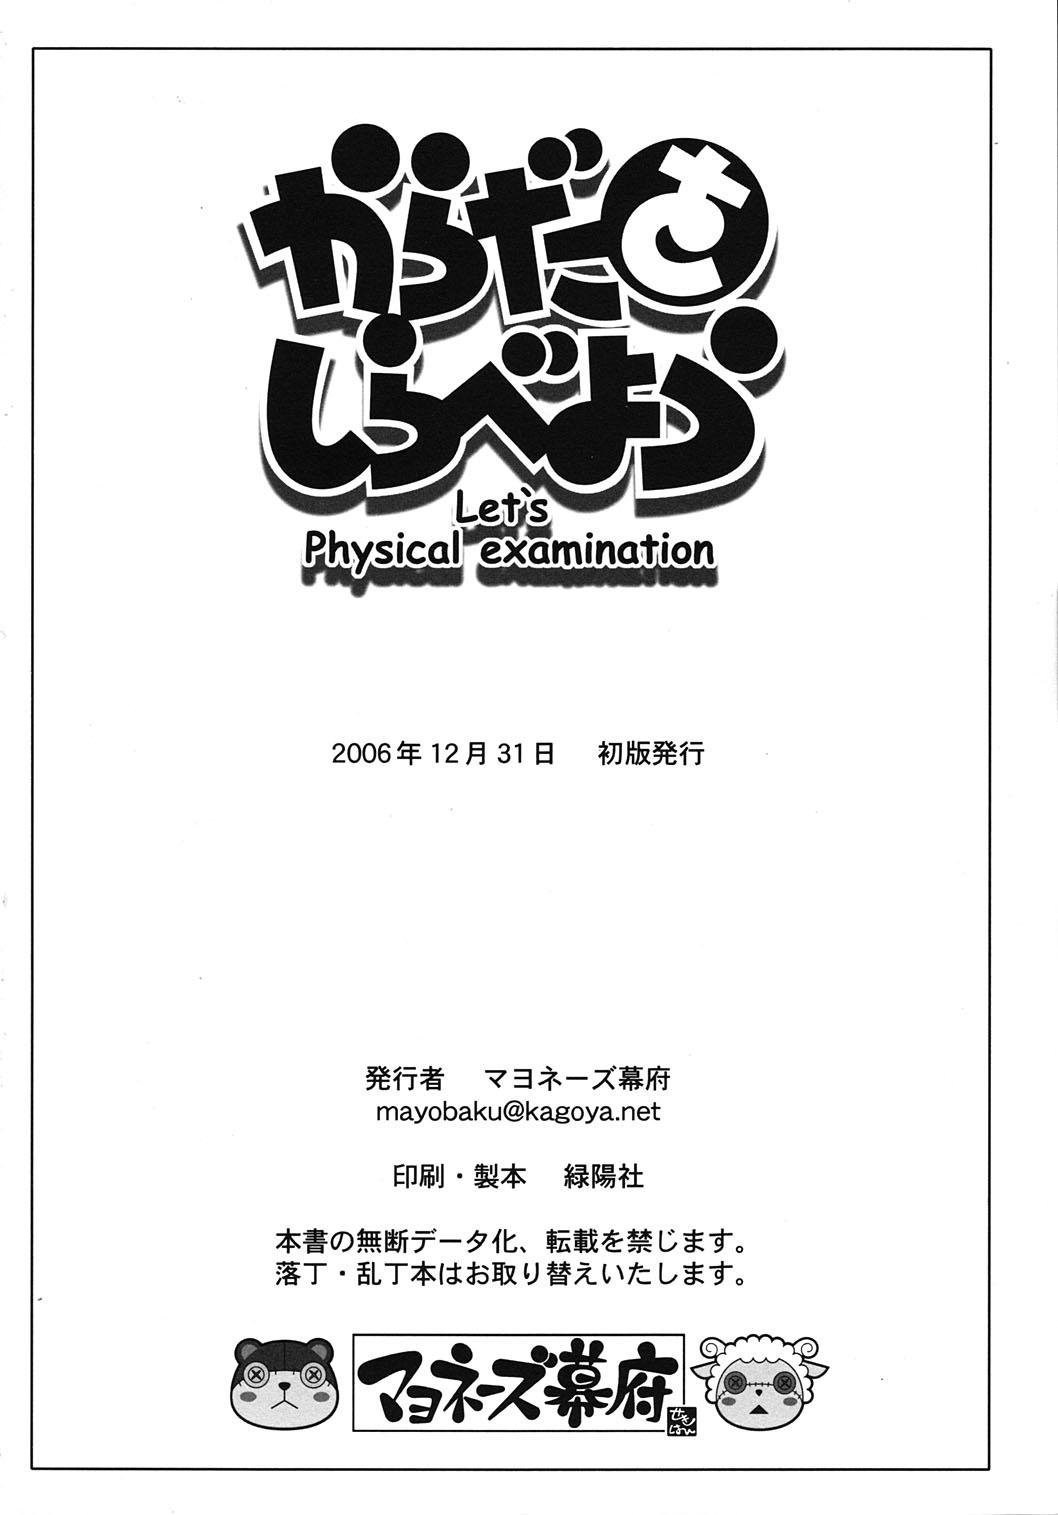 Karada wo Shirabeyou ~ Let's Physical examination 28